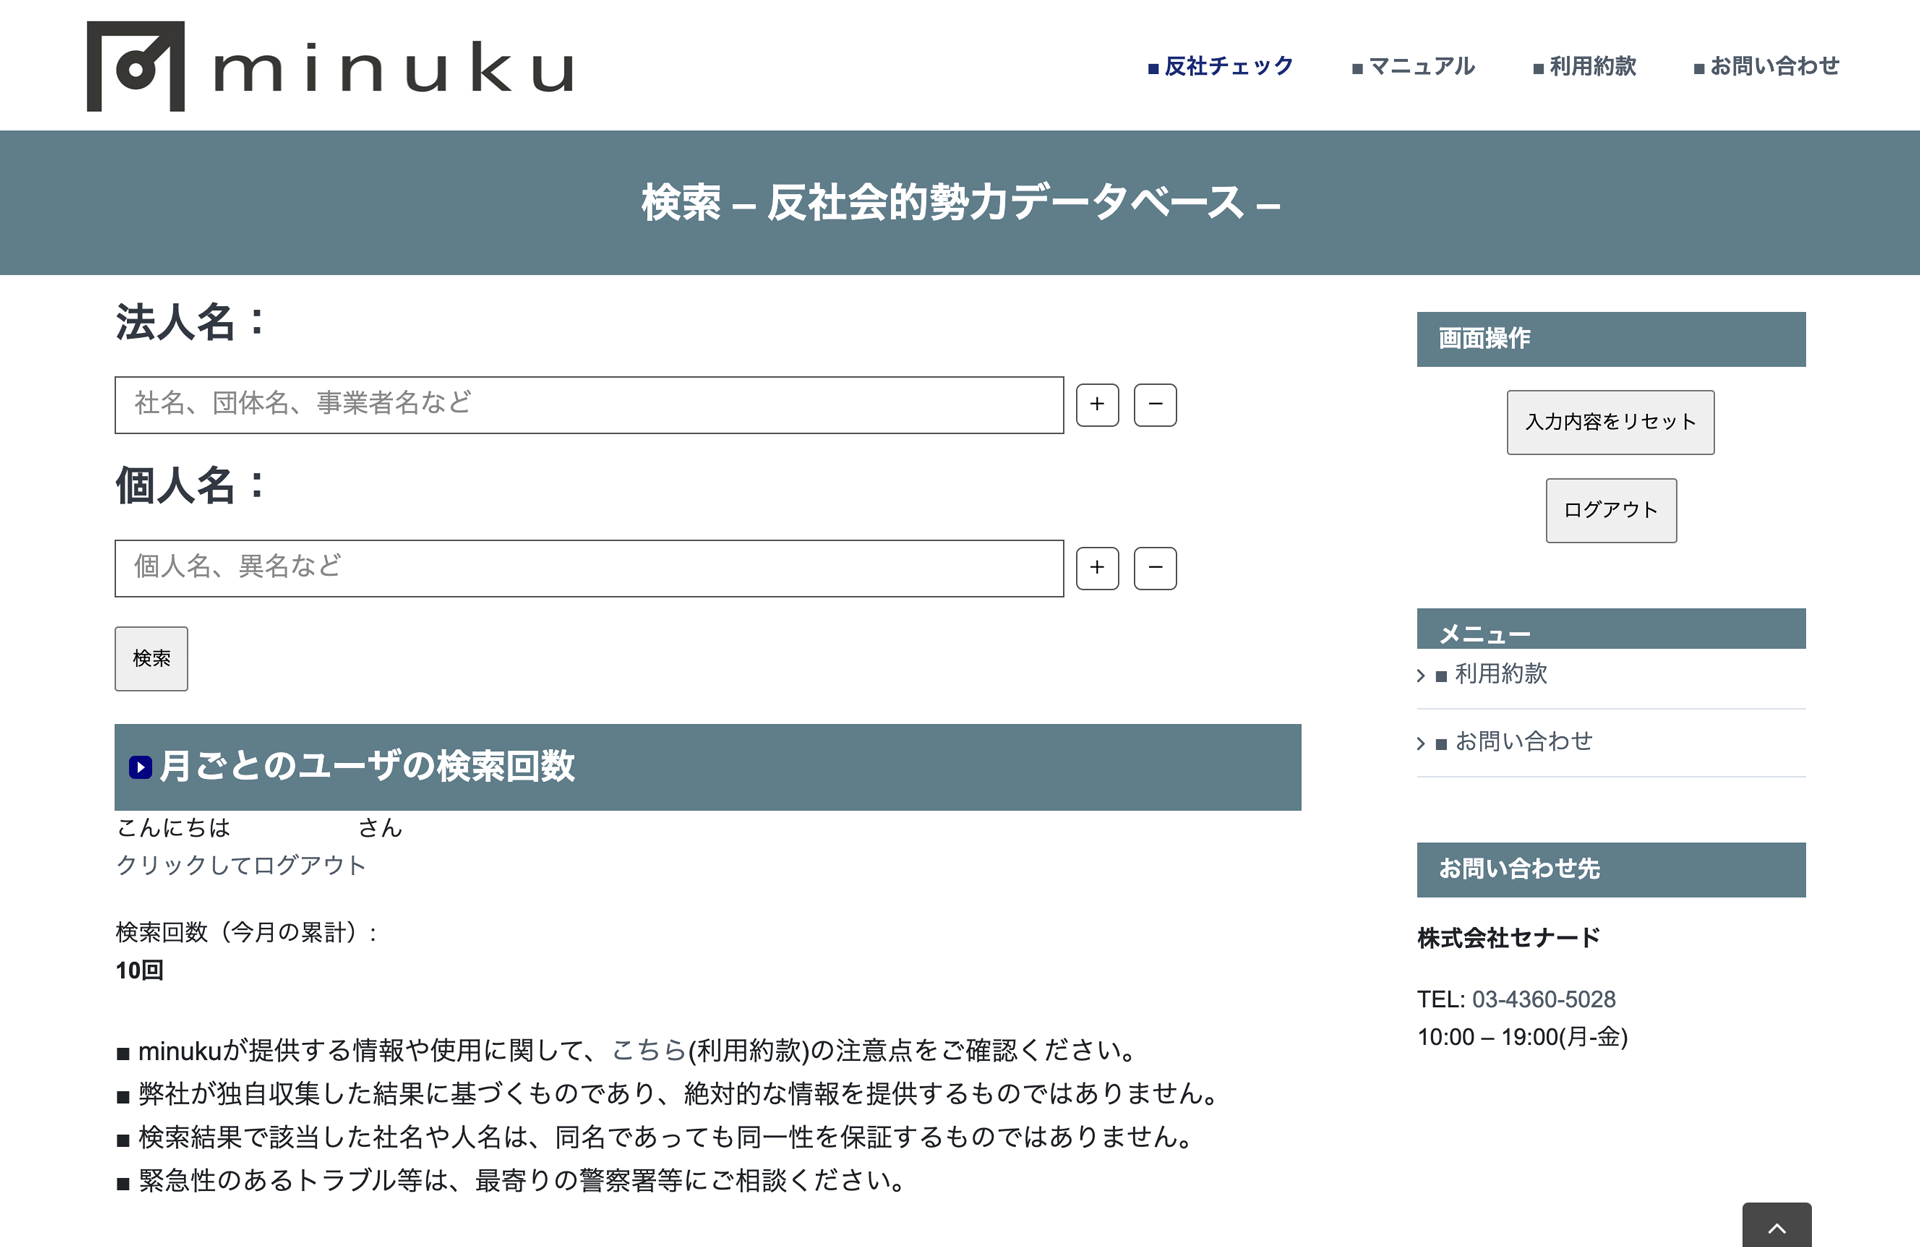 https://senard.co.jp/business/hansya_check/